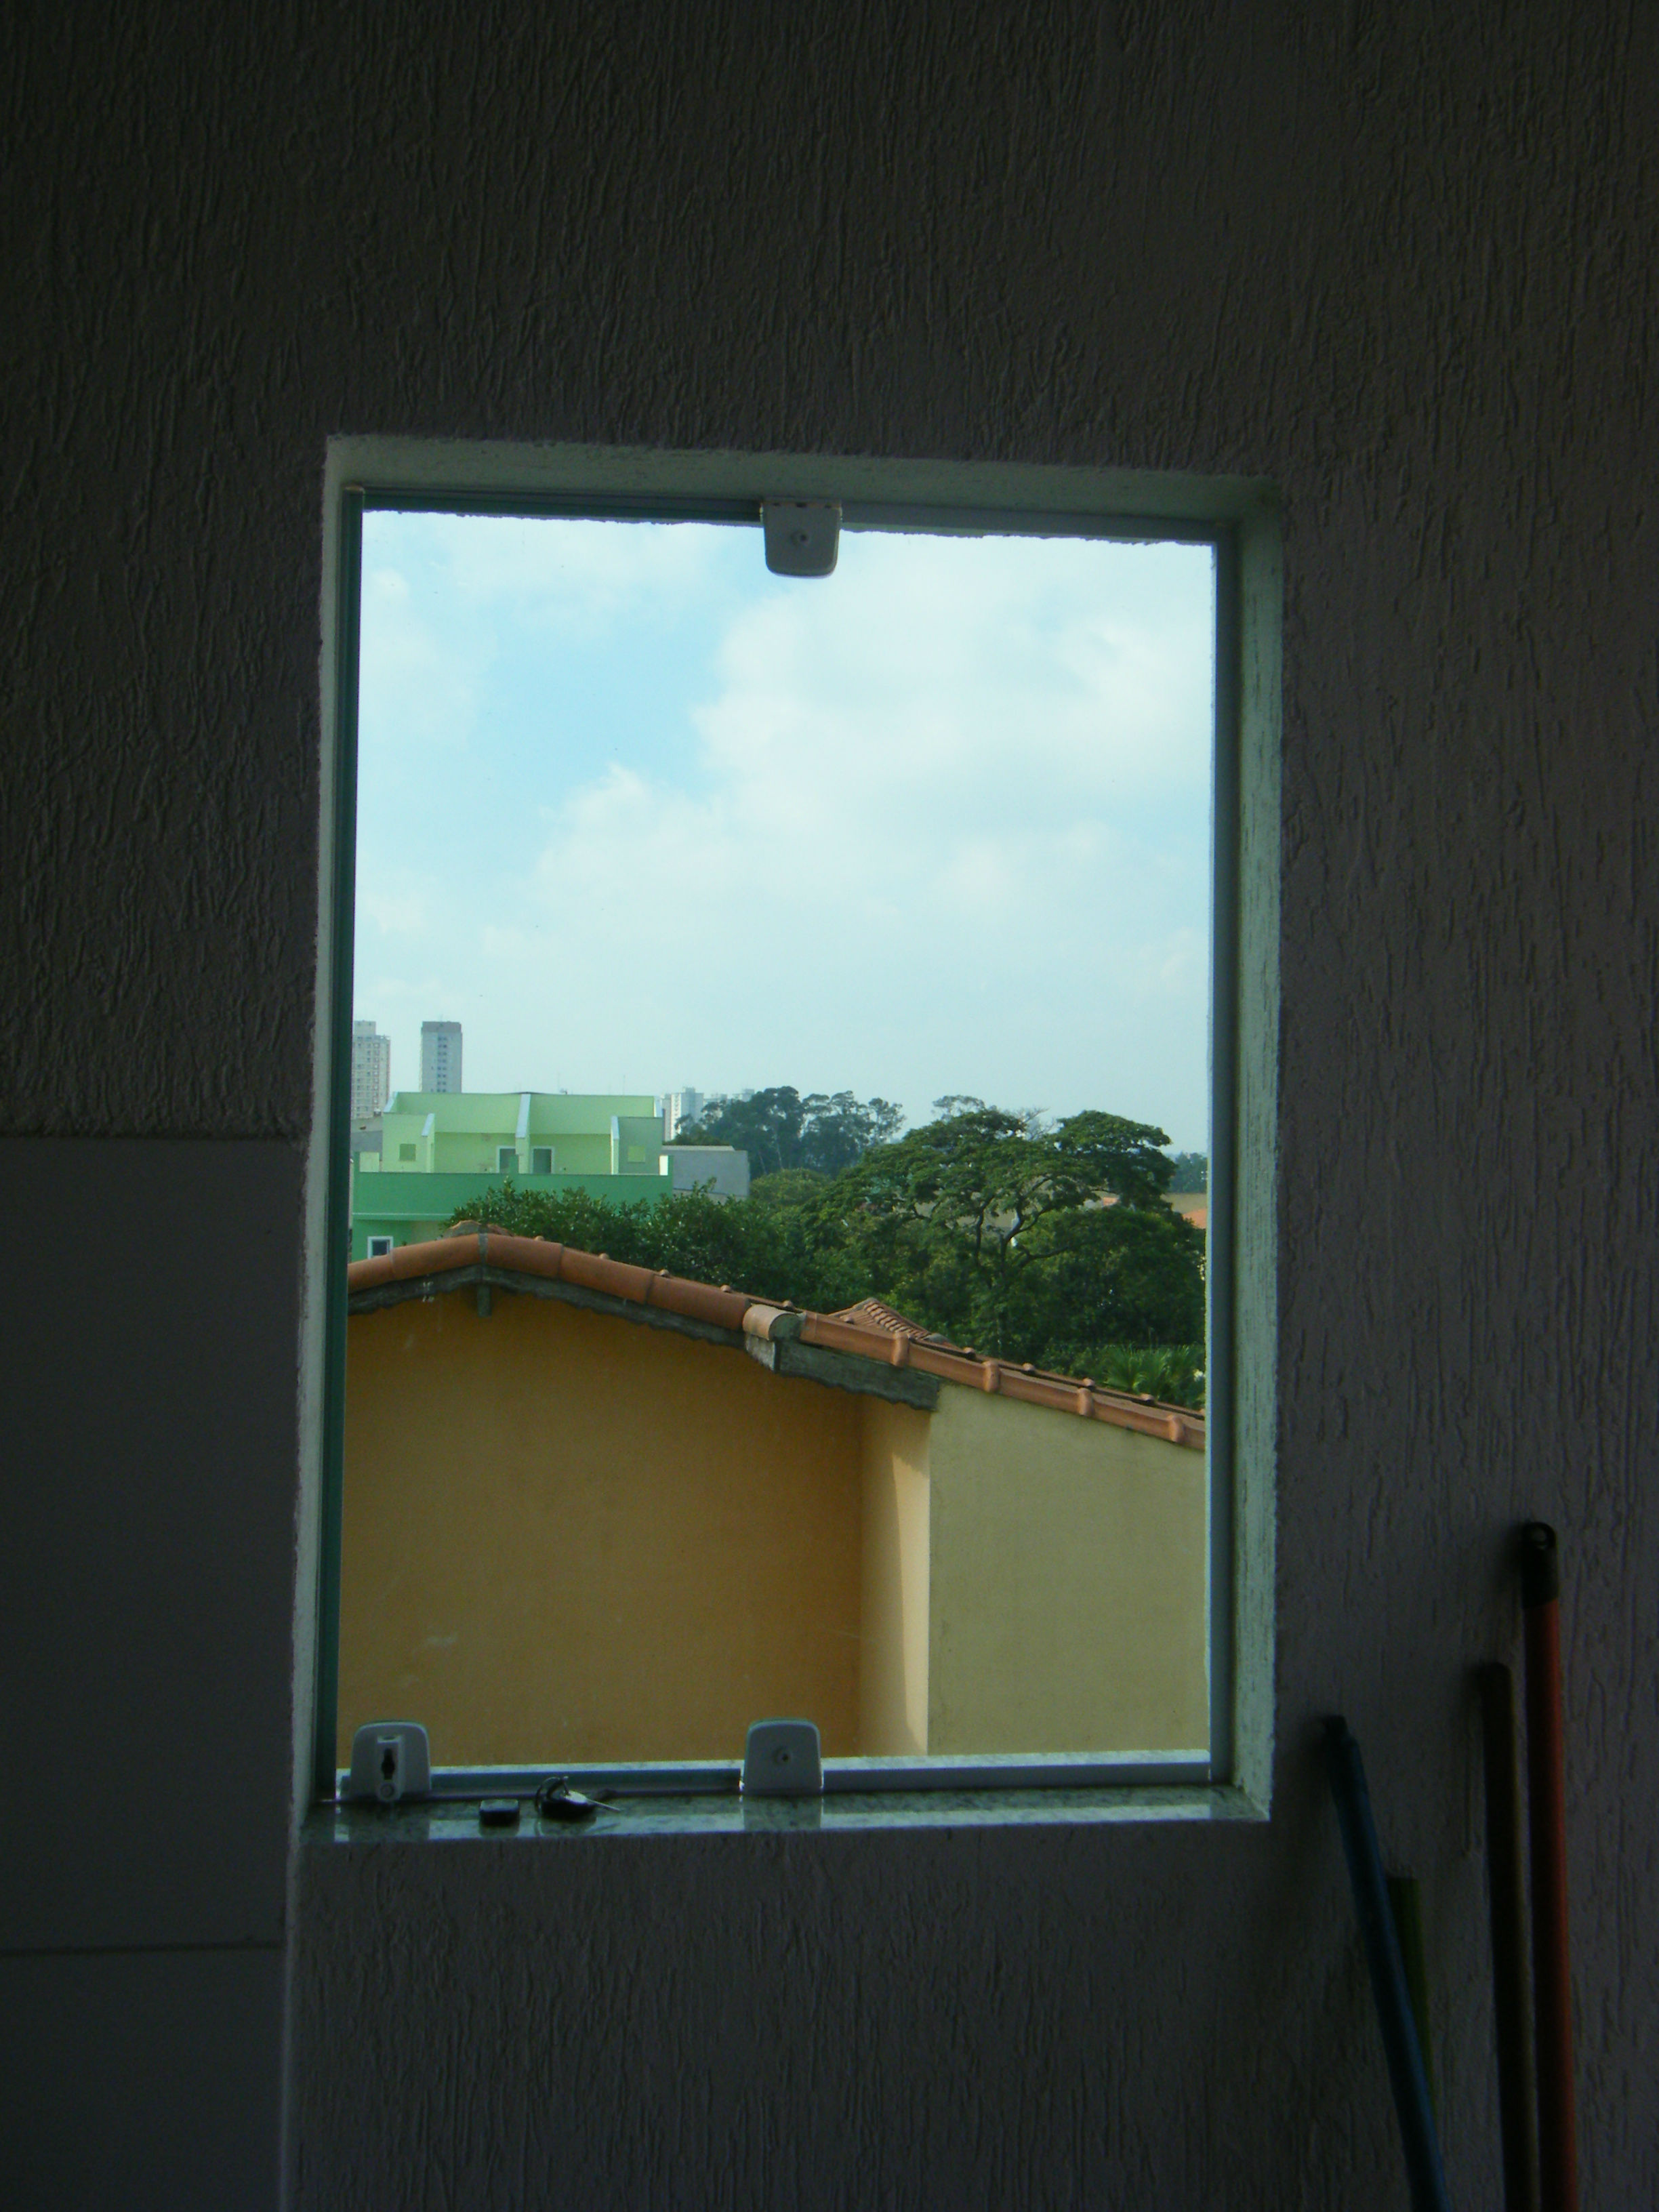 #388E93 de 2012 quinta janela pivotante janela em vidro verde 08mm temperado  446 Janelas De Vidros Temperados  Rj